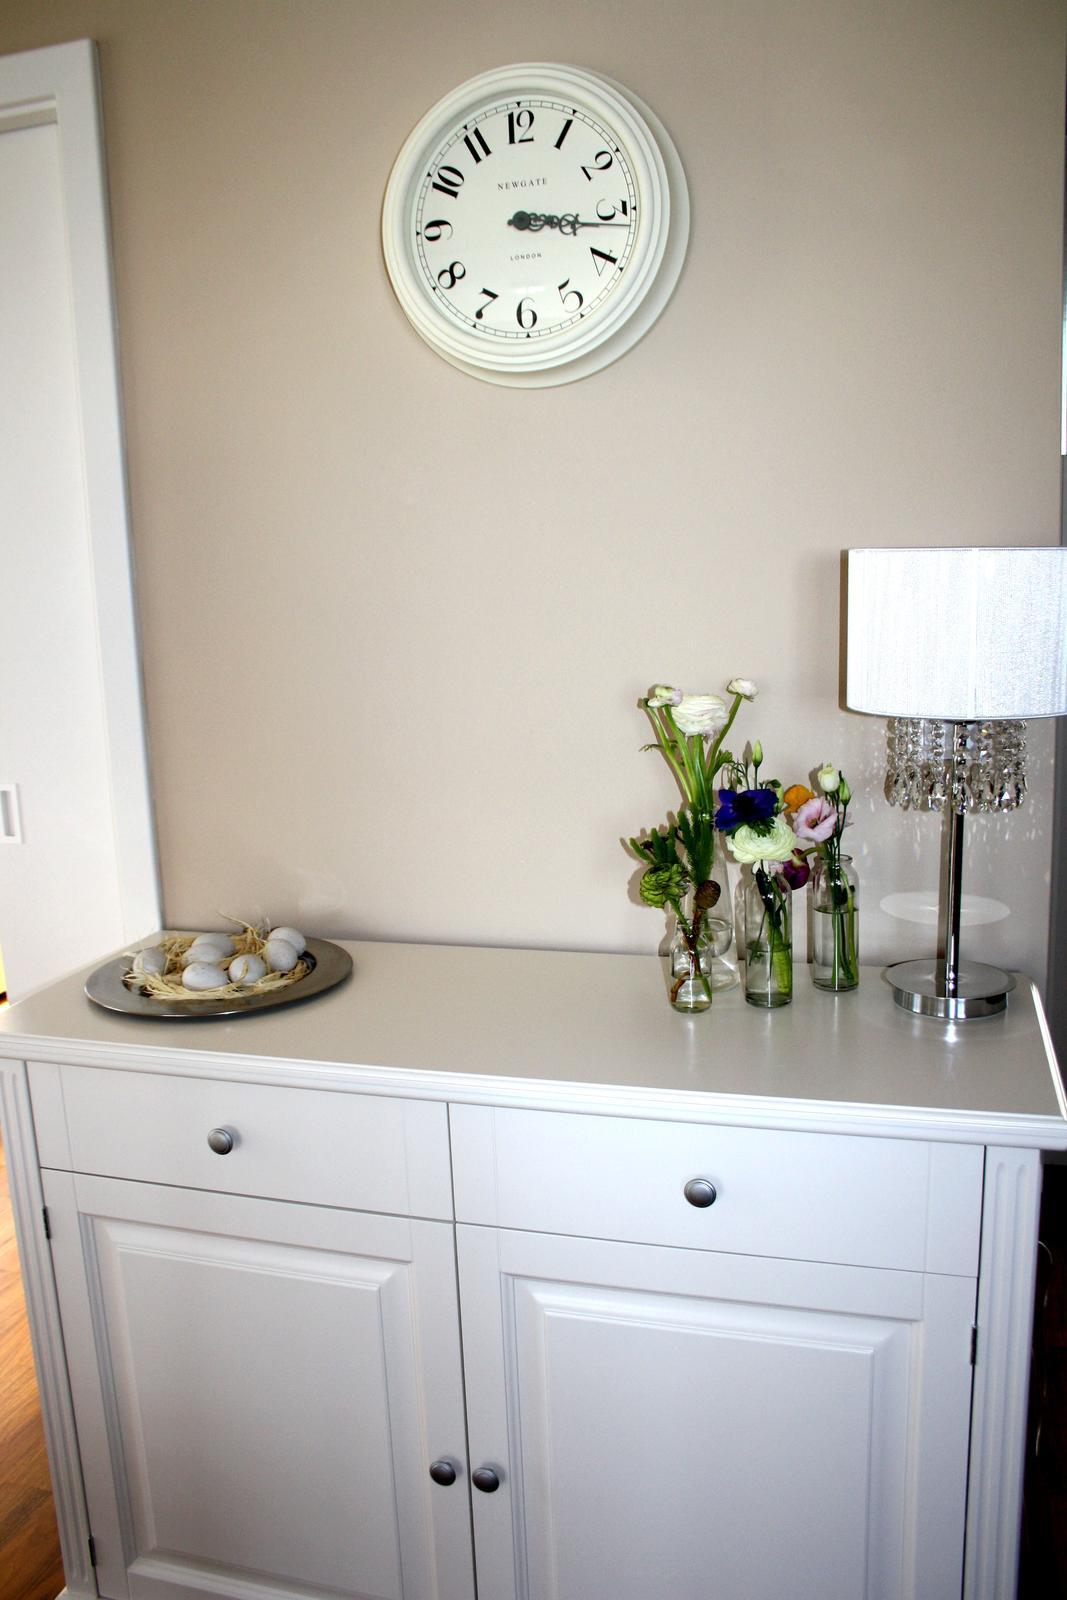 Jarne a letne aranzmany a dekoracie - komoda v jedalni